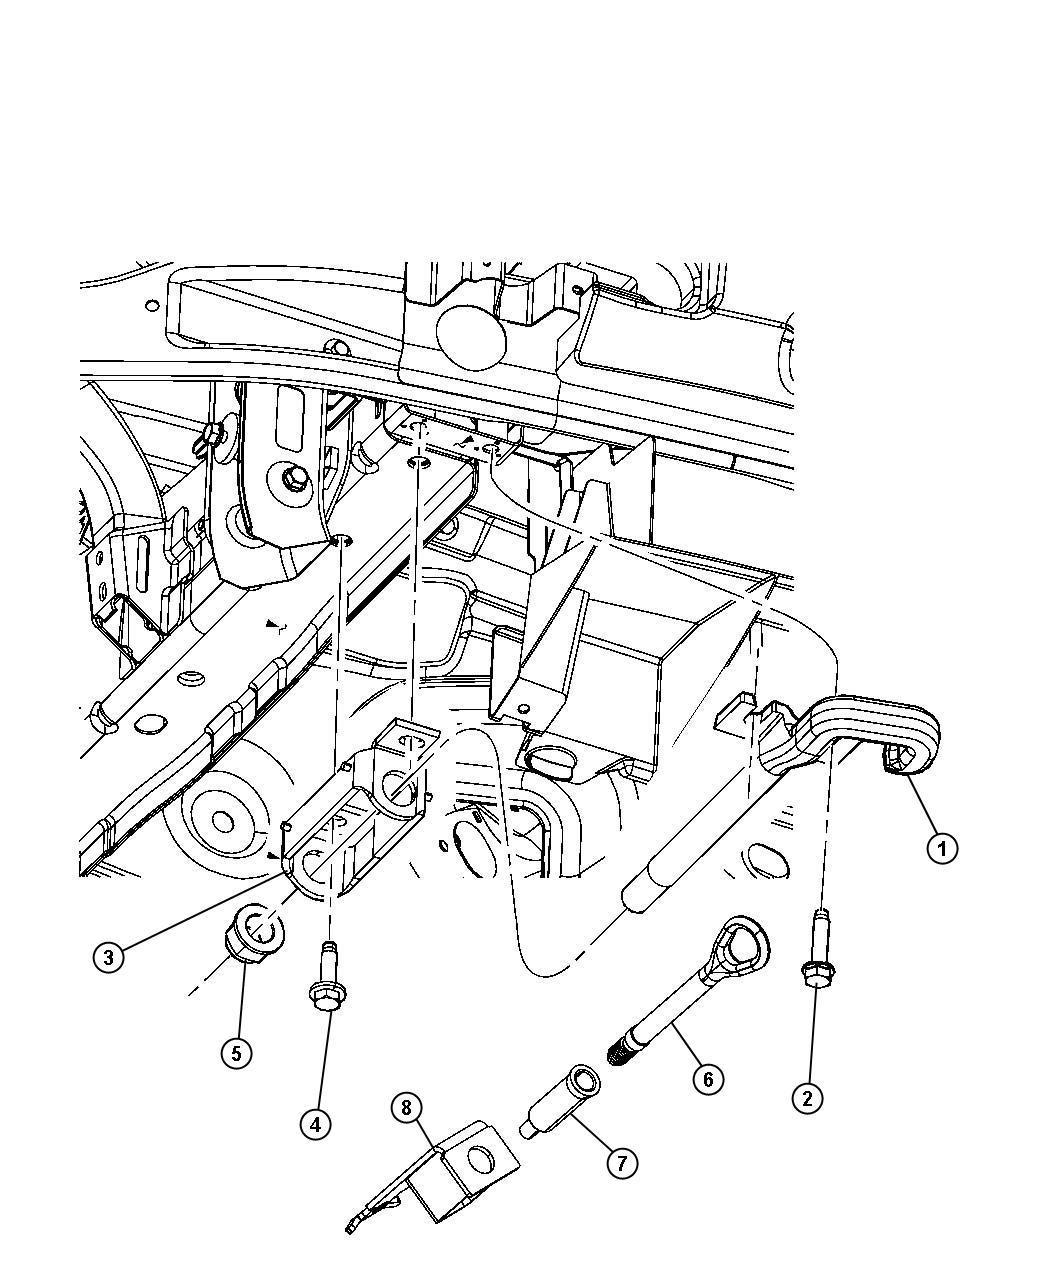 2013 Jeep Grand Cherokee Bracket. Tow hook. [tow eye